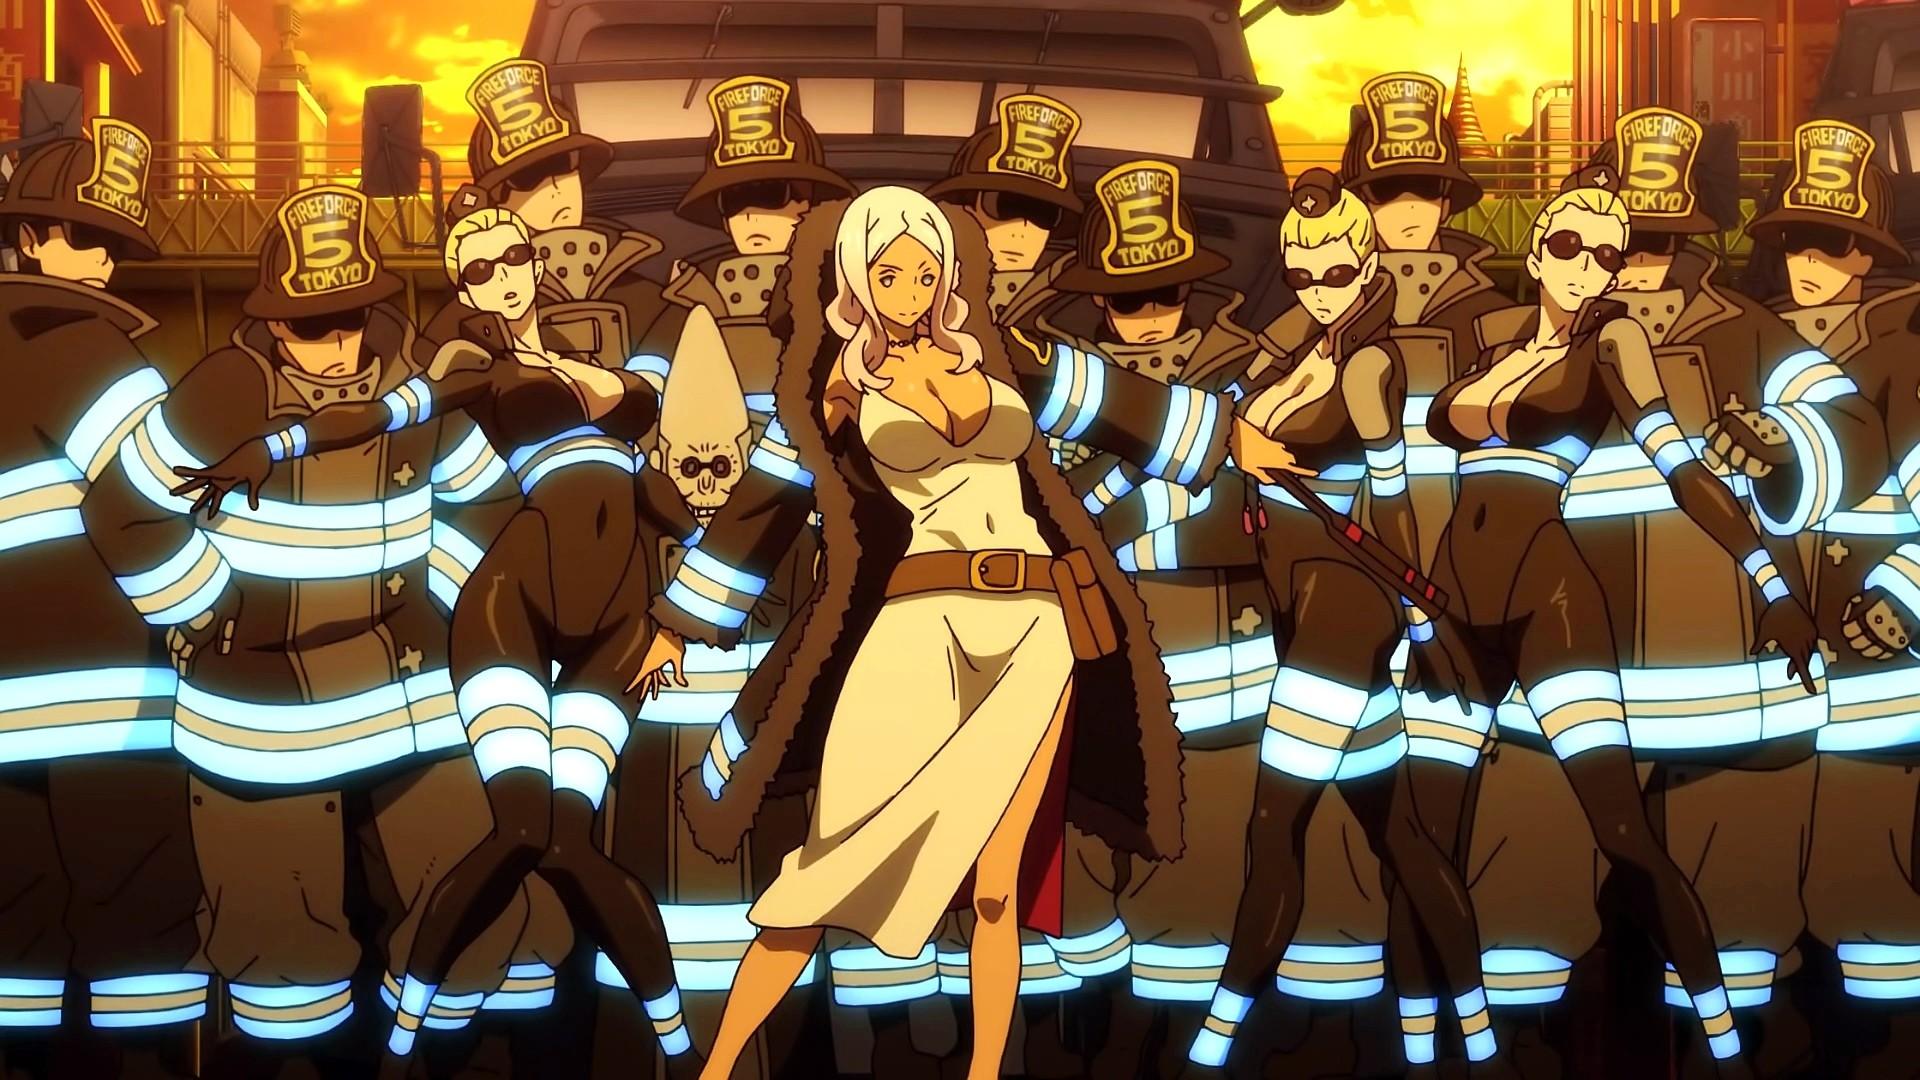 Fire Force hd wallpaper download